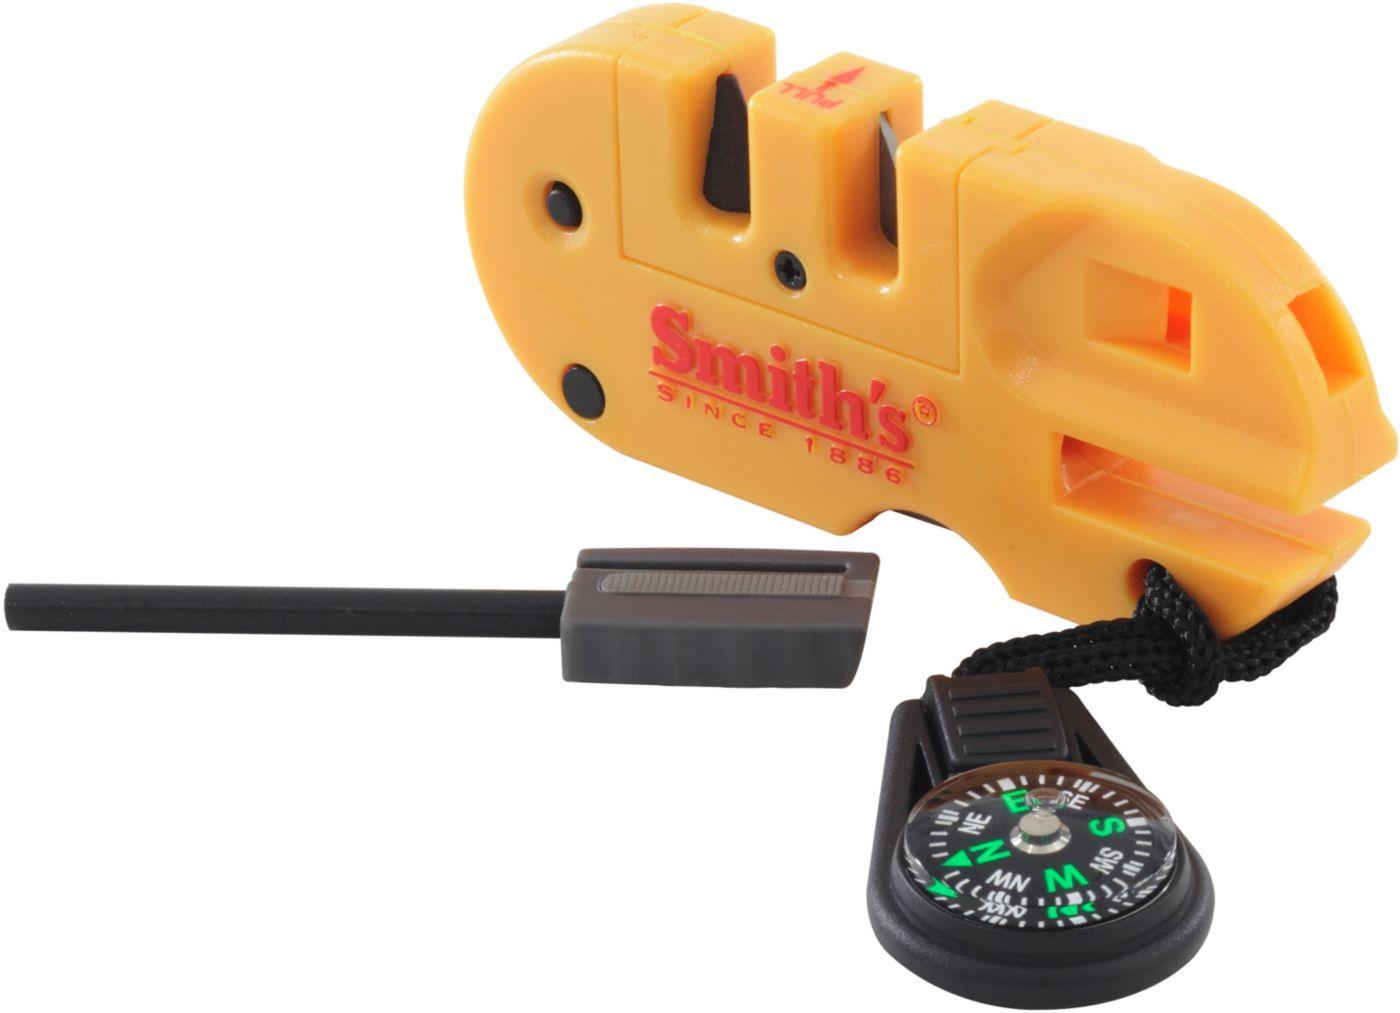 Smith's Pocket Pal X2 Knife Sharpener & Survival Tool